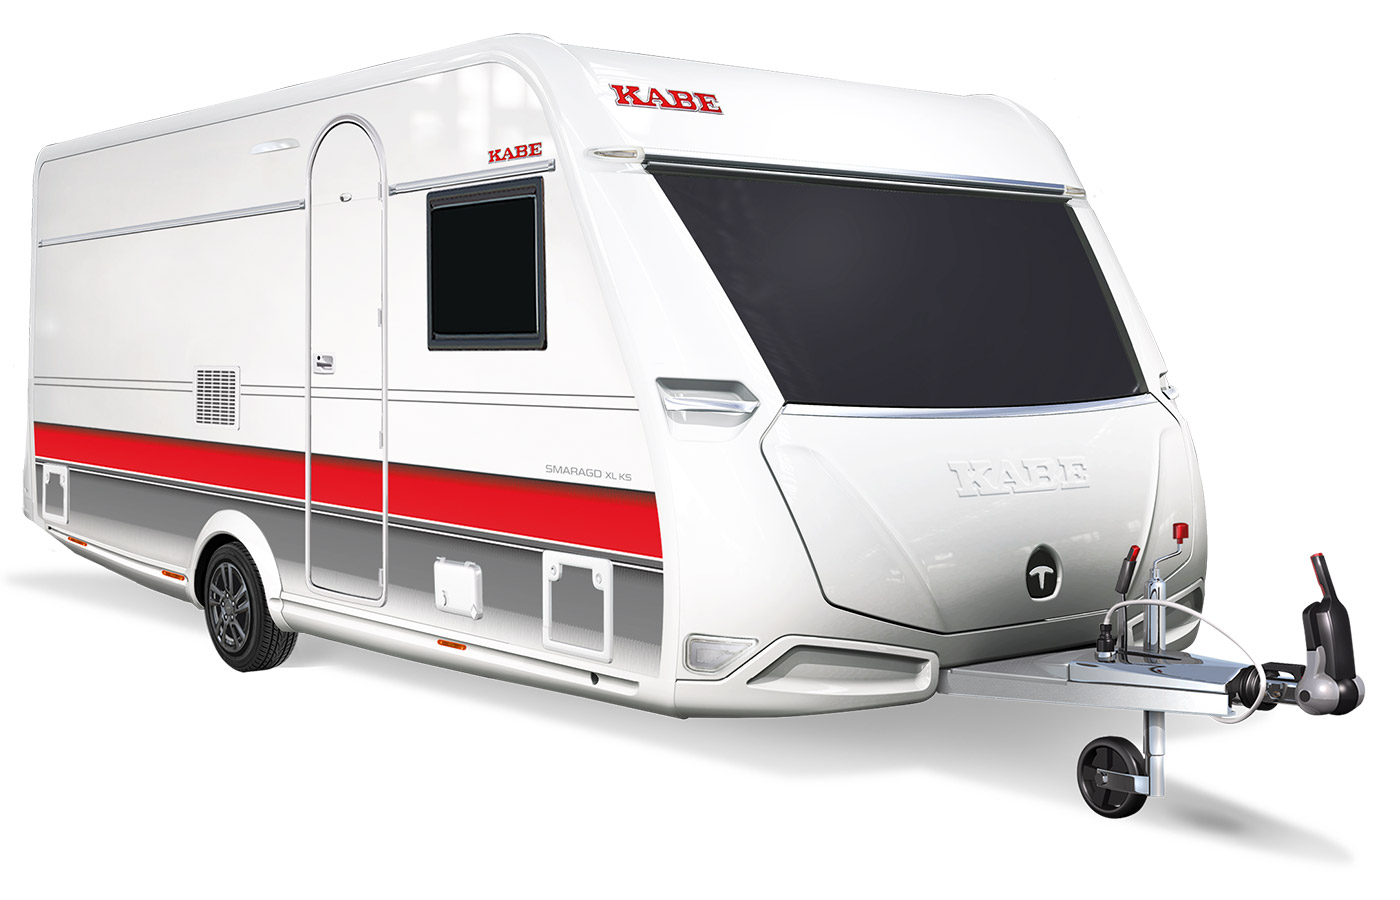 Kabe - Smaragd 520 XL